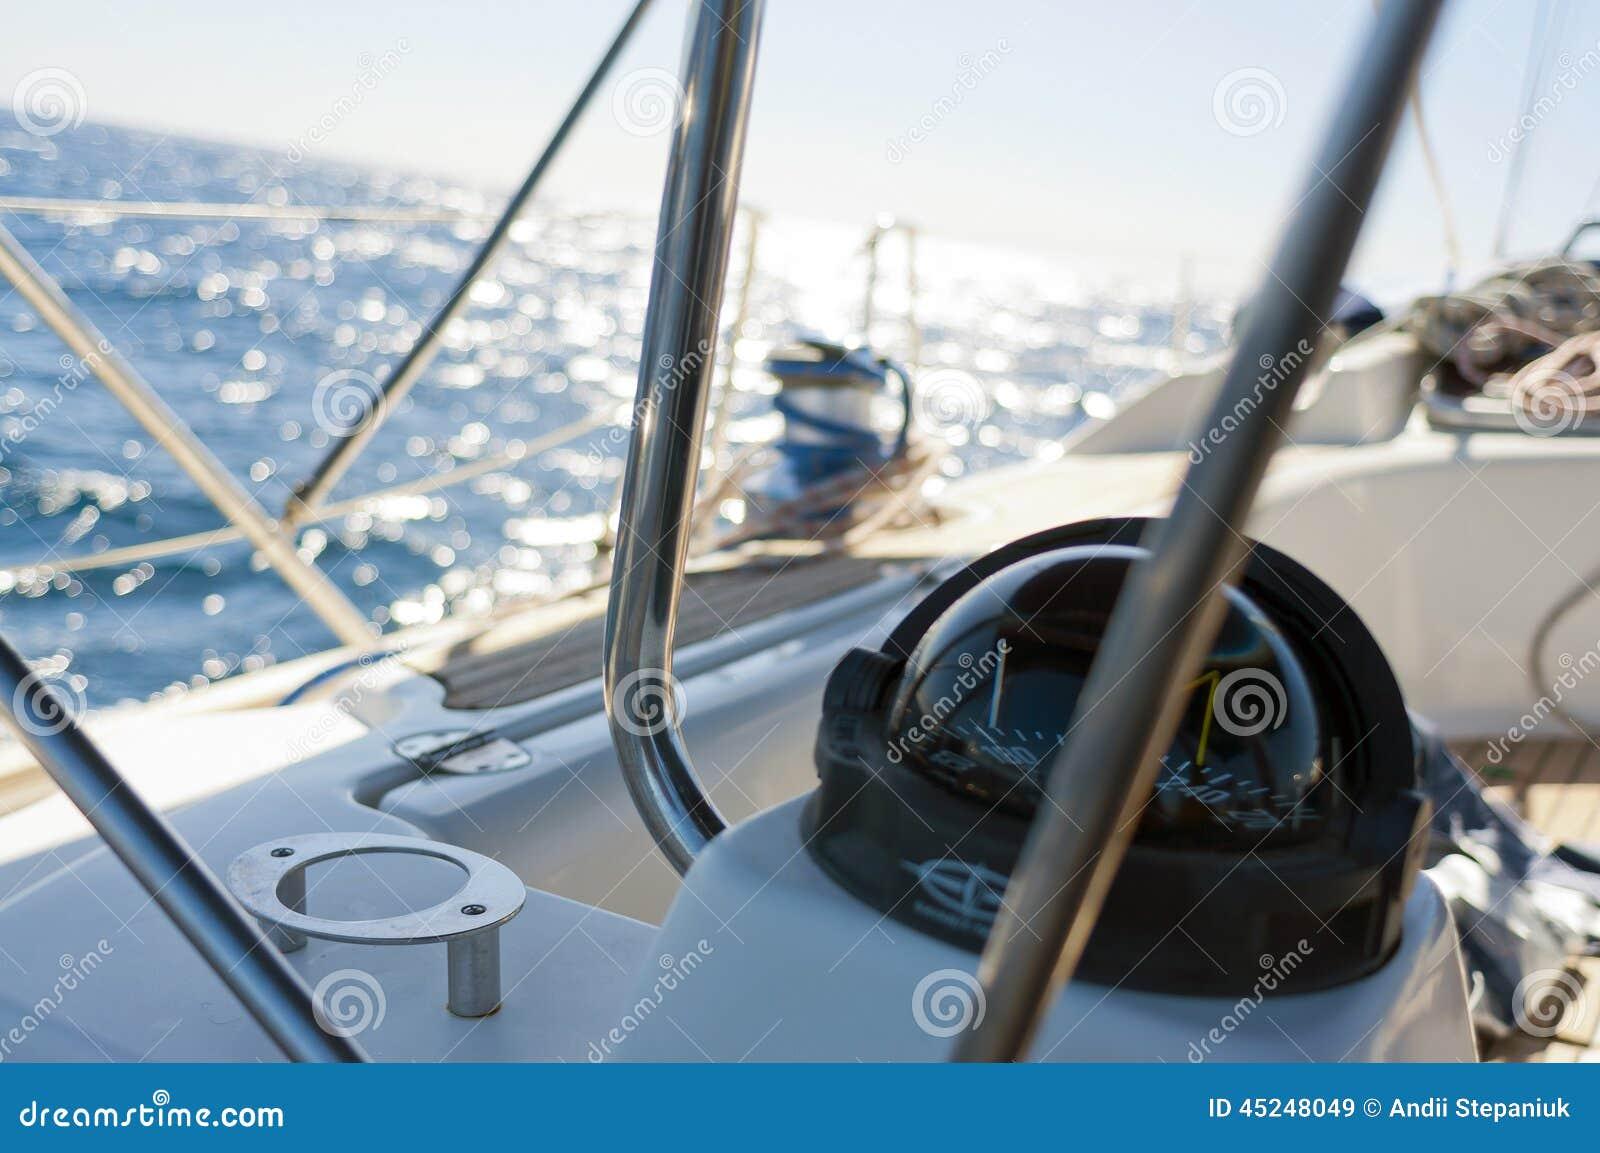 Sailing Yacht Compass Stock Photo - Image: 45248049